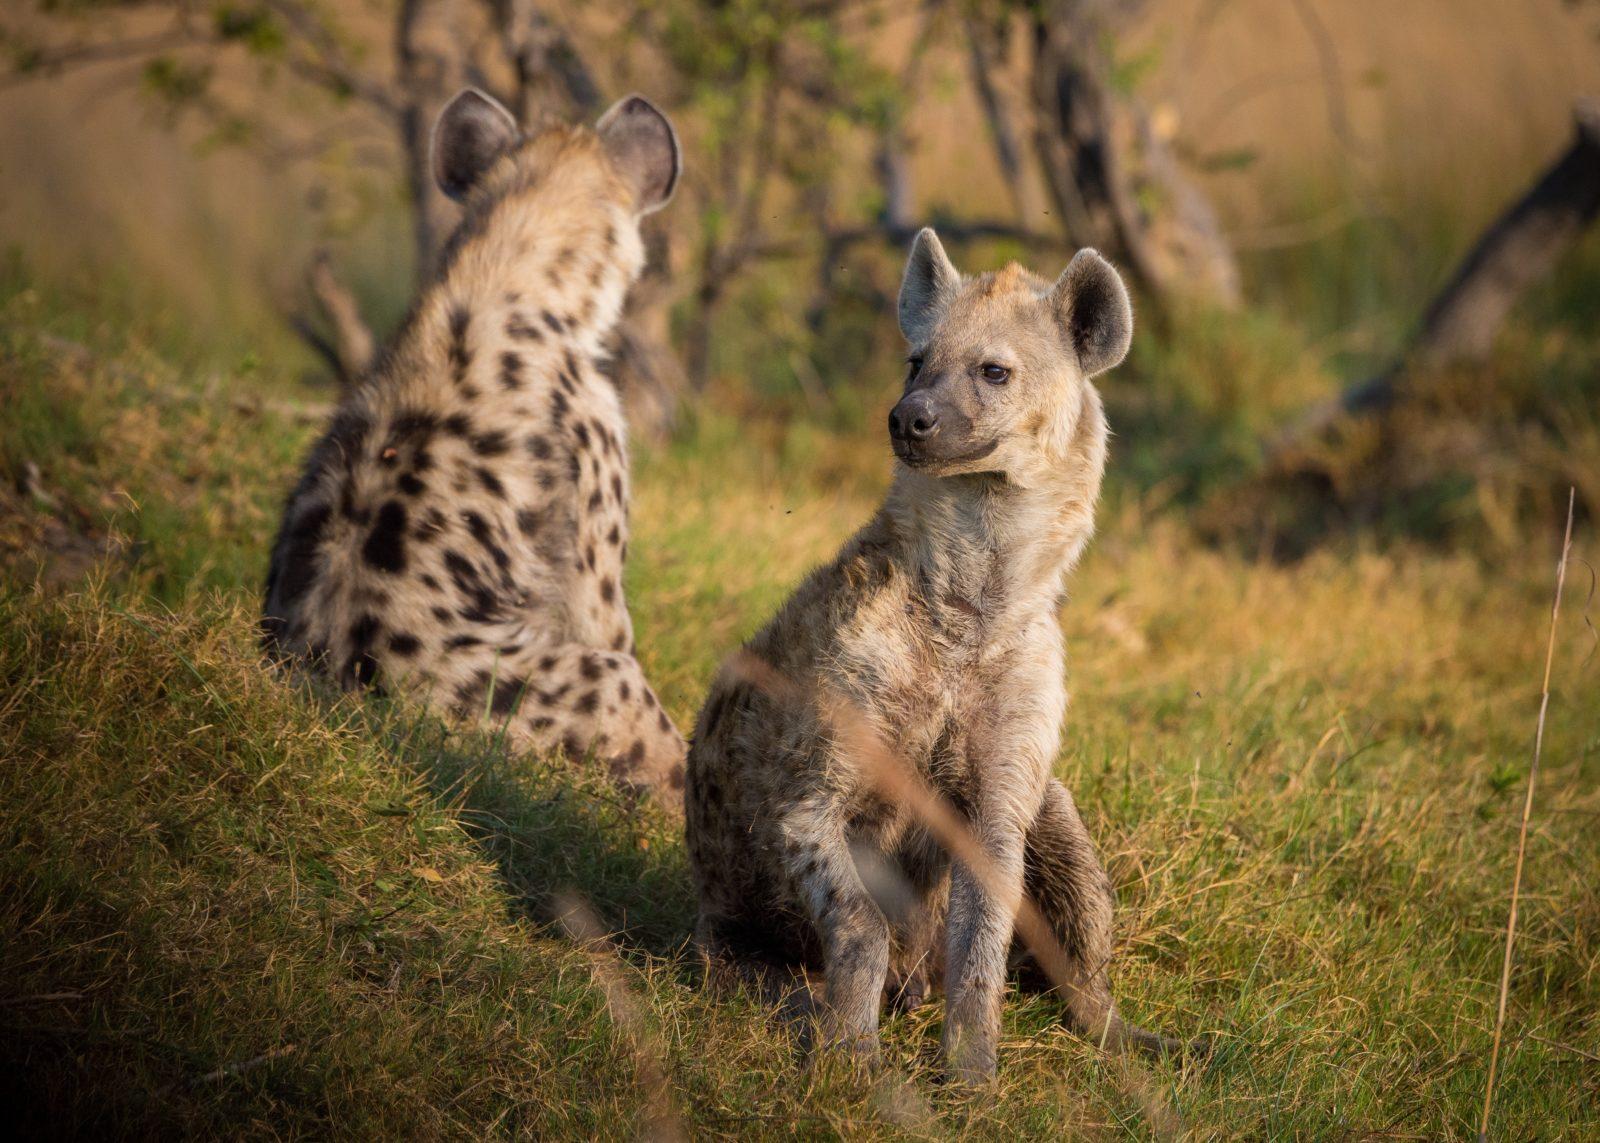 A hiena é uma naimal carnívoro e carniceiro.